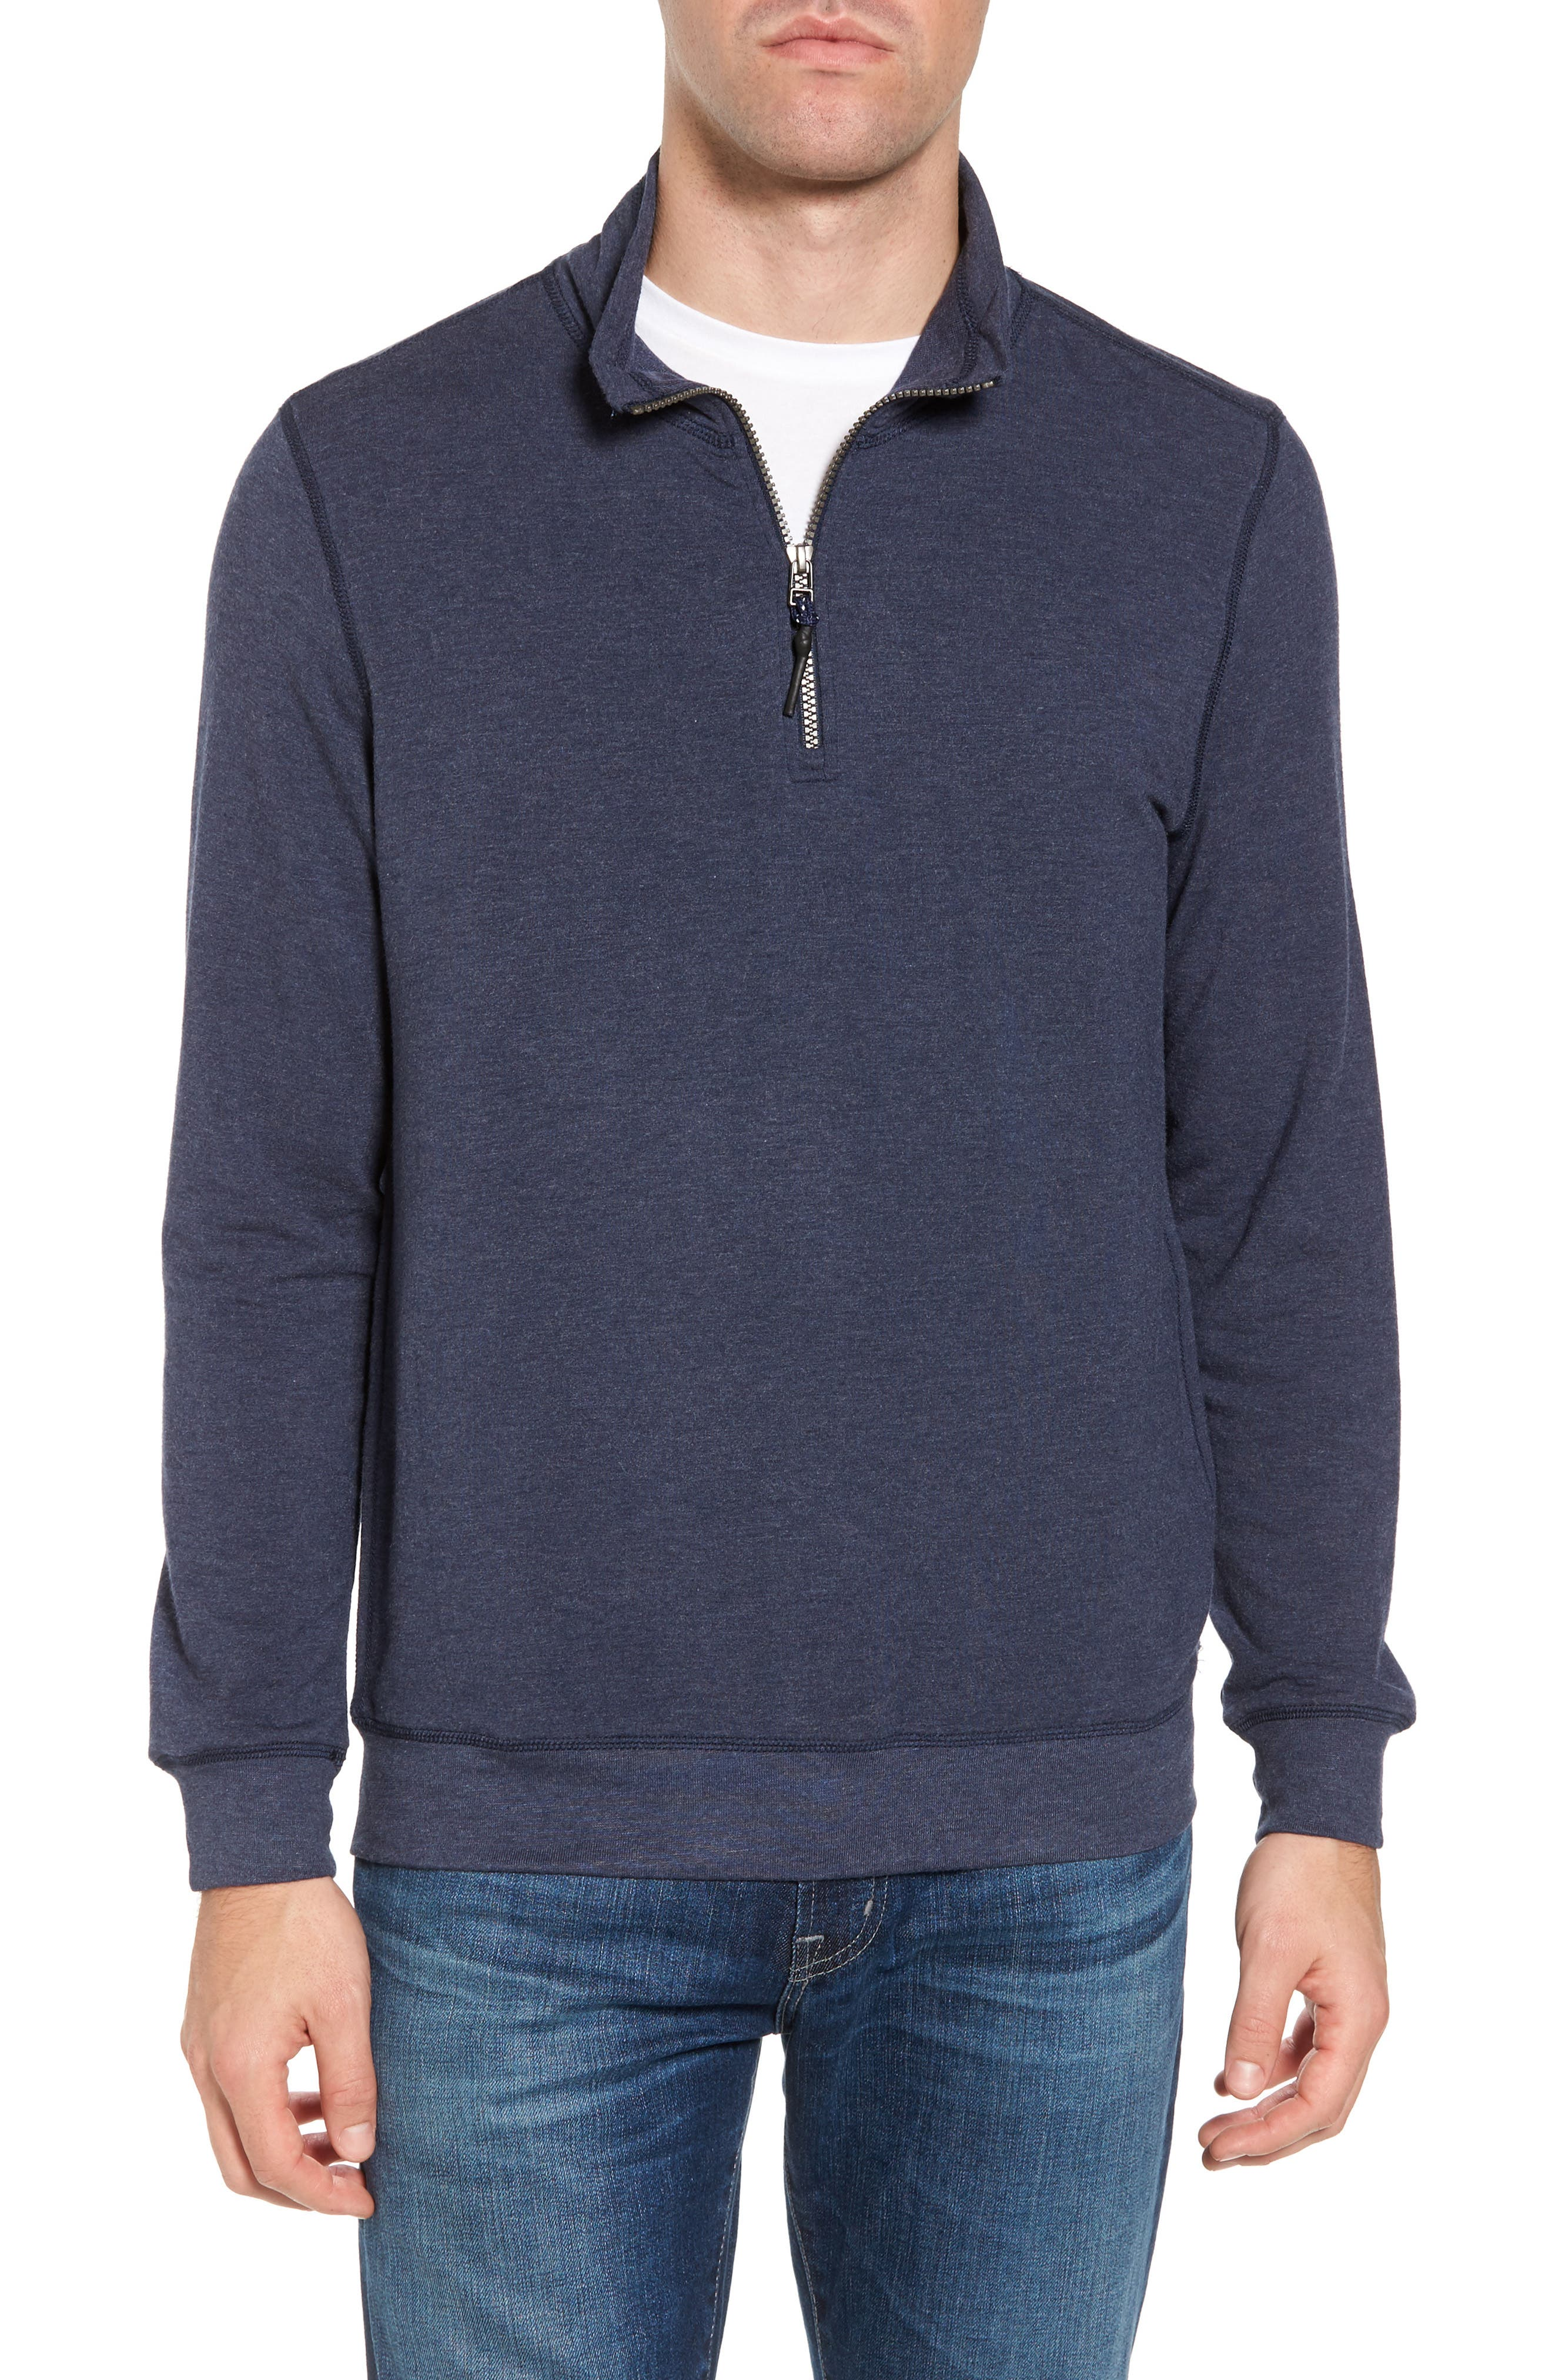 Surfside Supply Brushback Quarter Zip Pullover